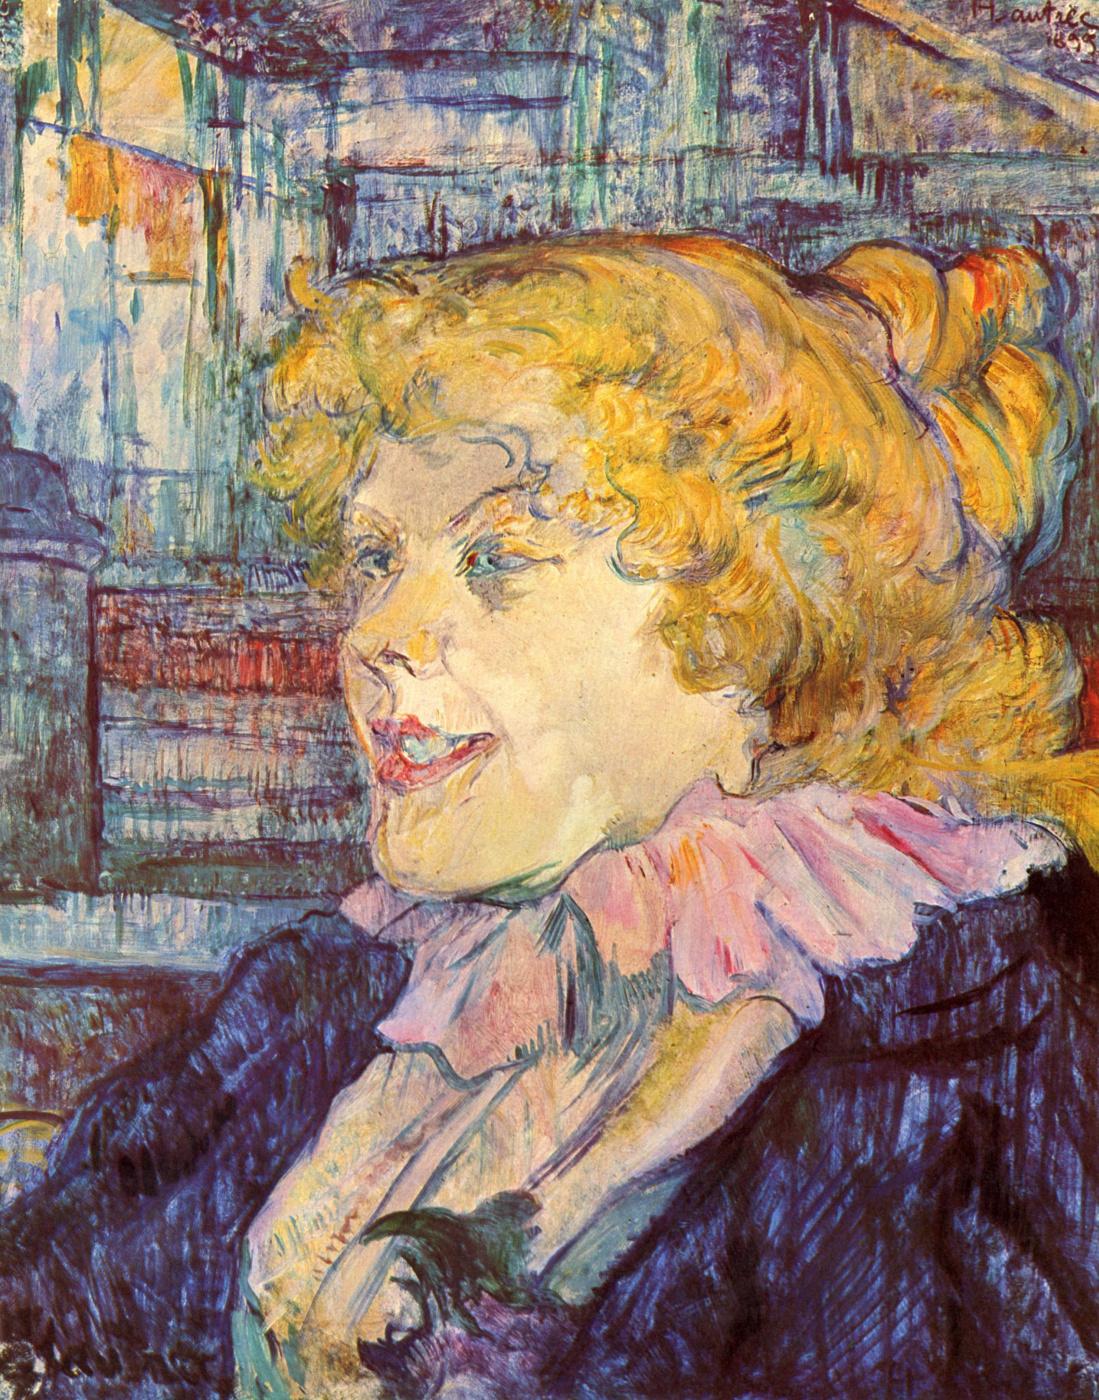 Henri de Toulouse-Lautrec. Portrait of Miss Dolly, a waitress at the Star in Le Havre